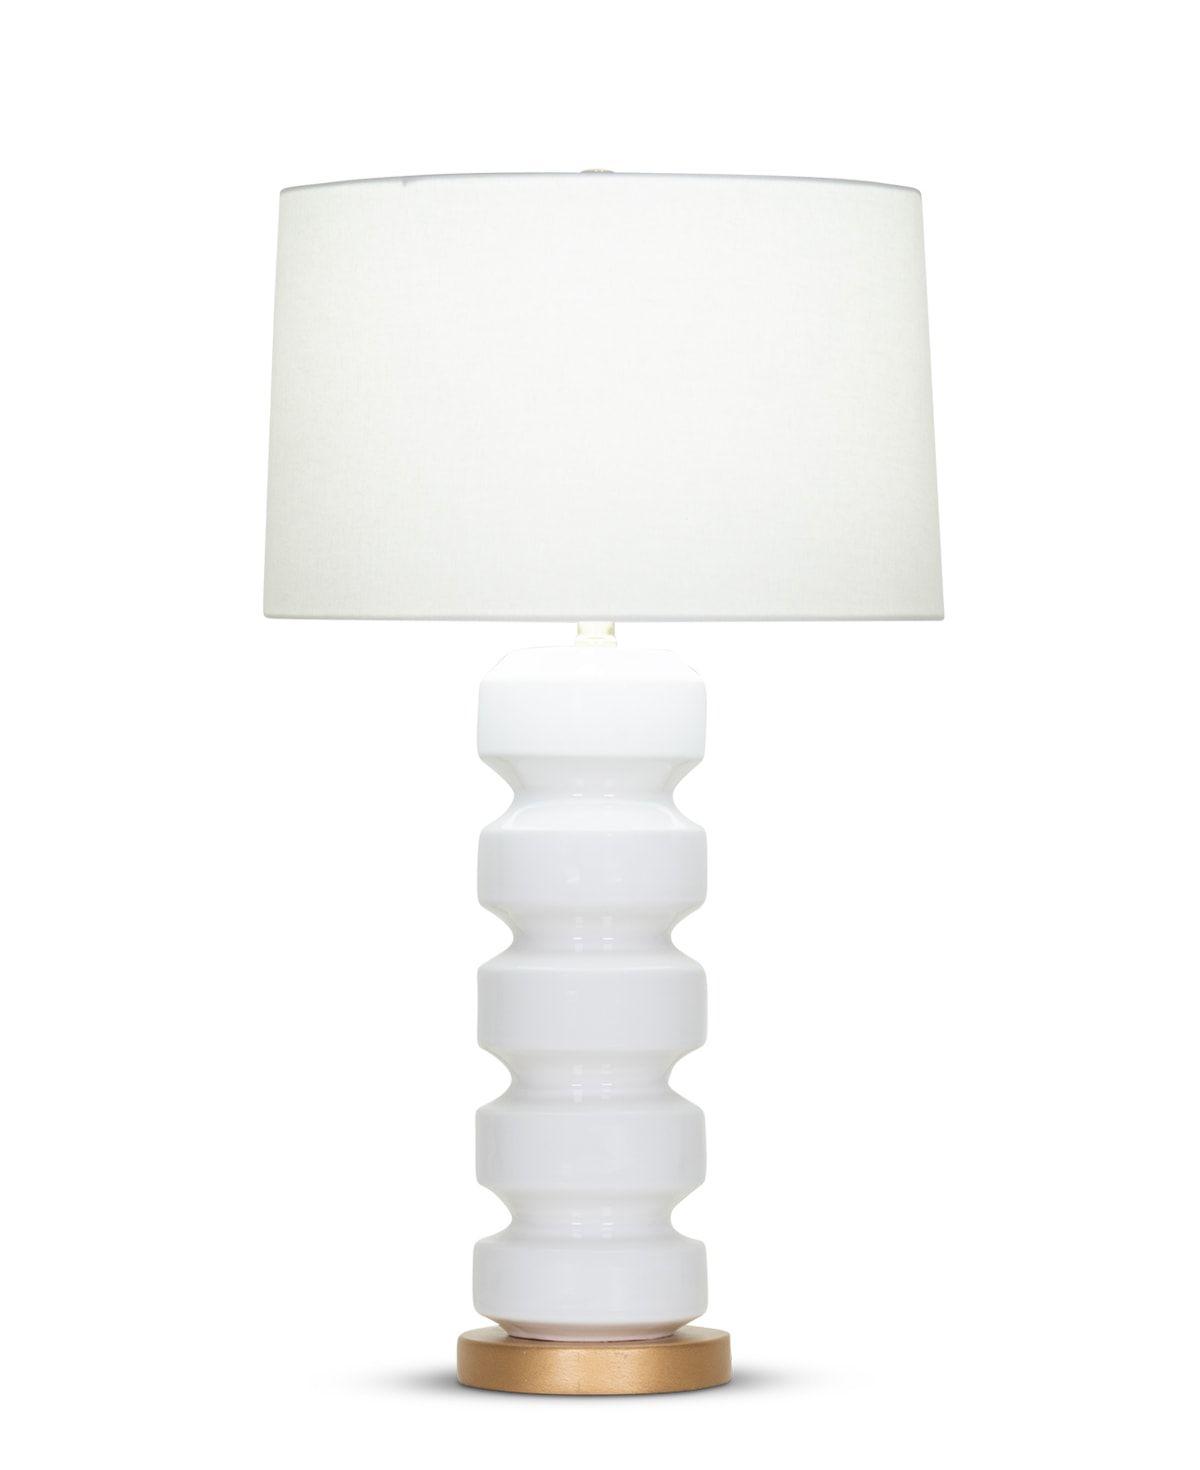 Skylar Table Lamp Flowdecor Tall Table Lamps Table Lamp White Table Lamp